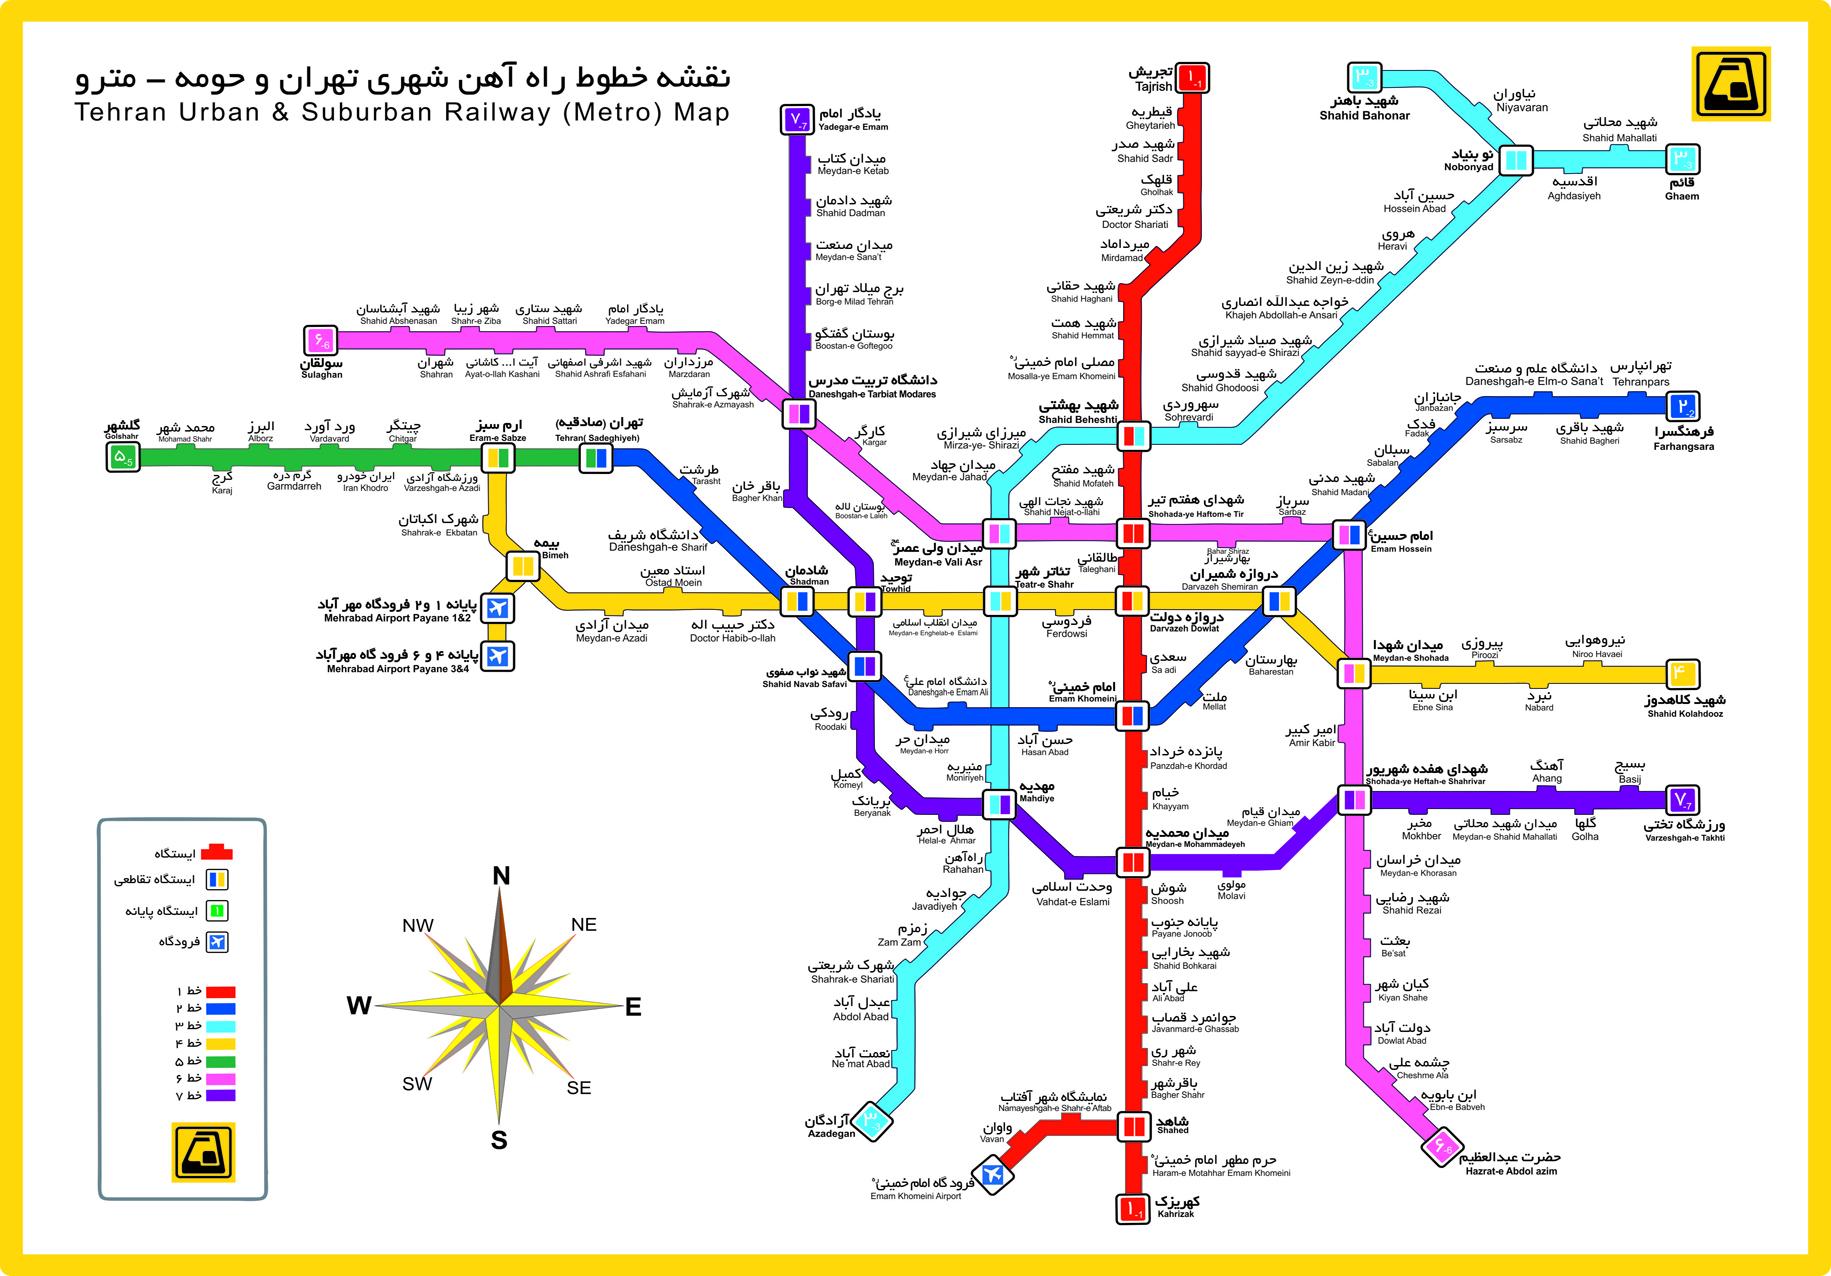 Photo of نقشه مترو تهران   نقشه جدید مترو تهران از خط 1 تا 7 به صورت کامل و واضح